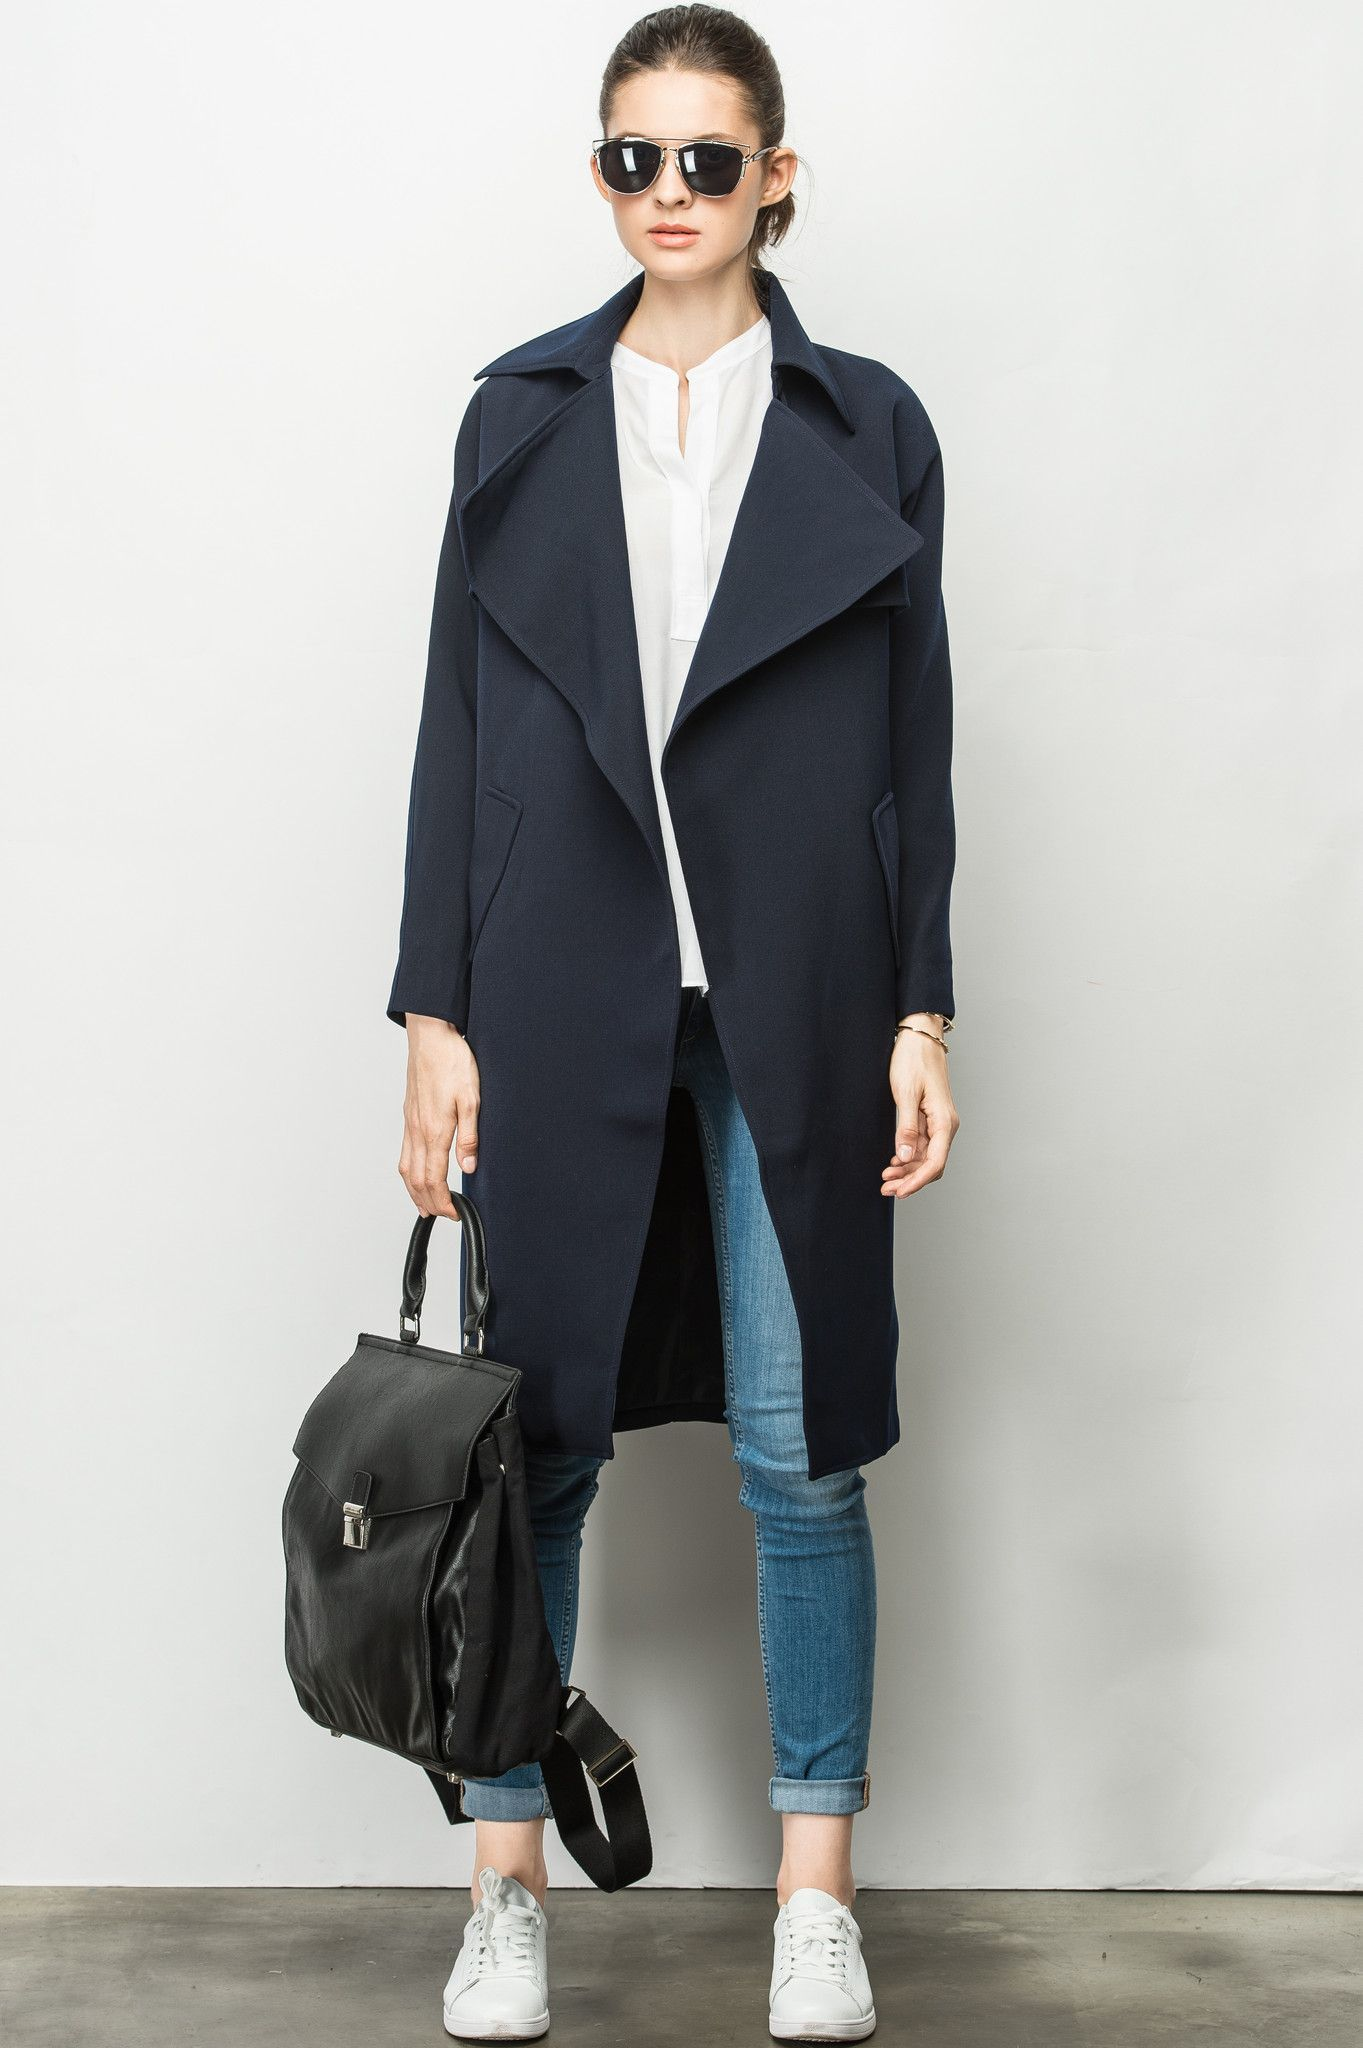 #AdoreWe Few Moda, Minimalistic Fashion Brands Online - Designer Few Moda Flapper Collar Jetsetter Jacket OU0067 - AdoreWe.com